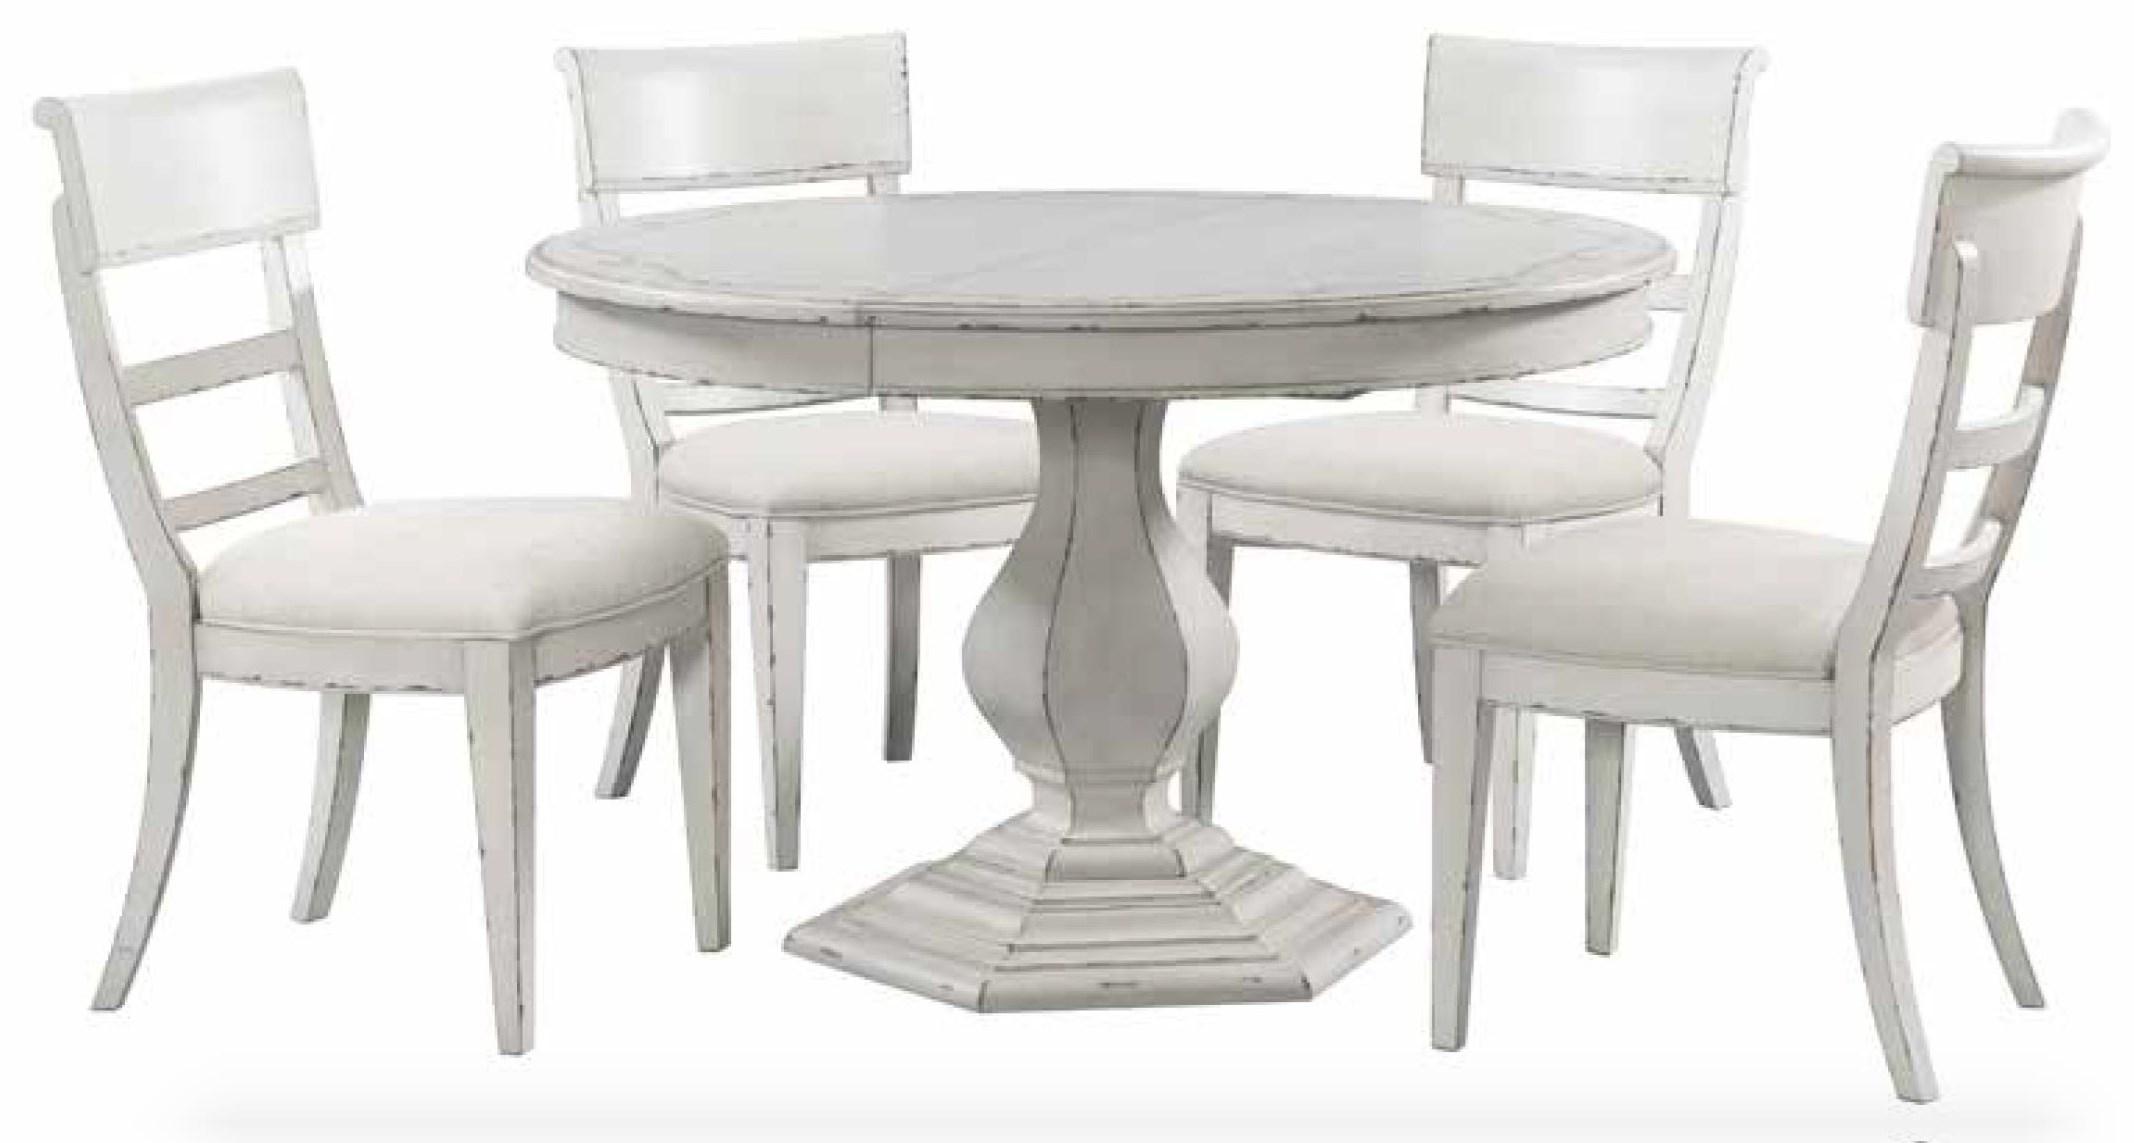 5 PC Round Dining Set